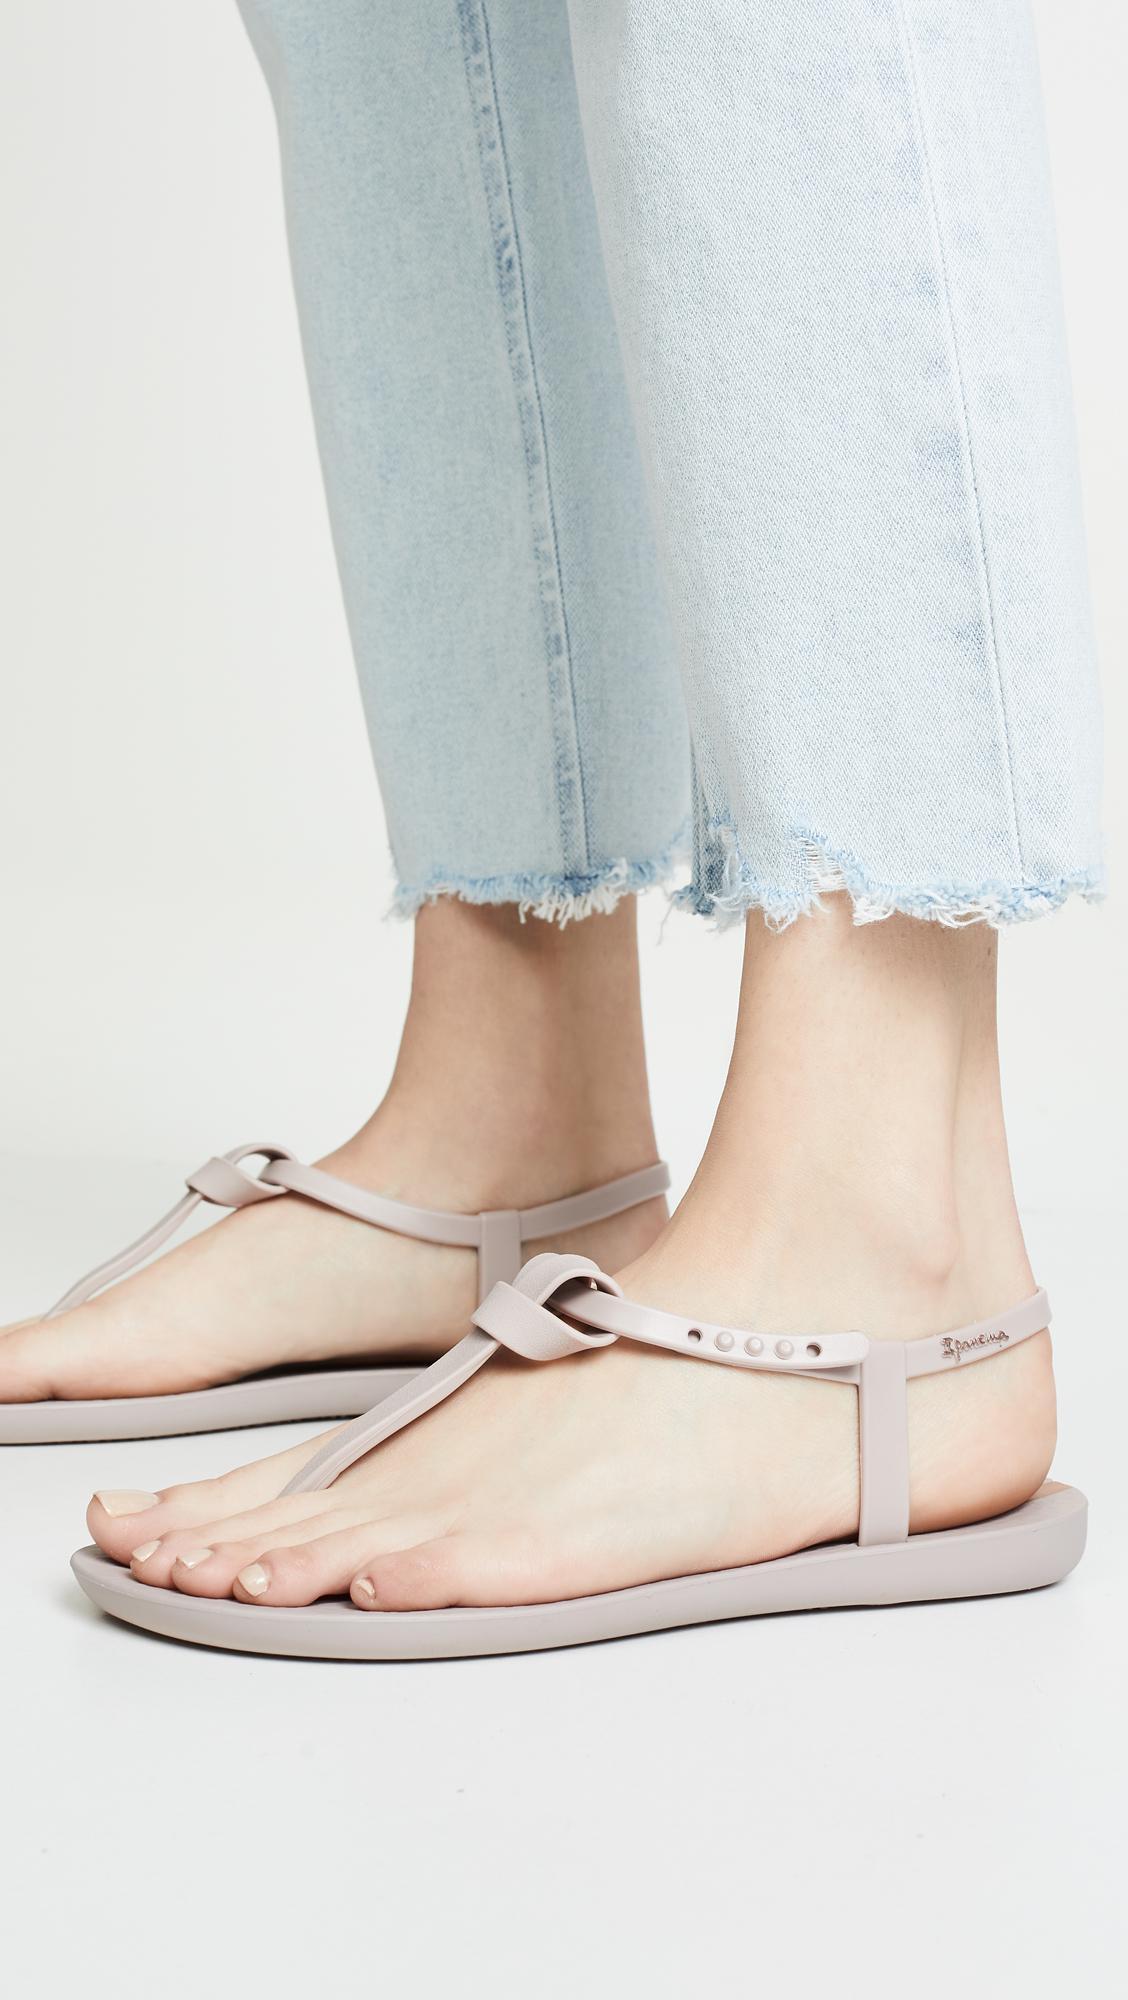 46bb3af657f2 Ipanema - Natural Ellie Knot T-strap Sandals - Lyst. View fullscreen